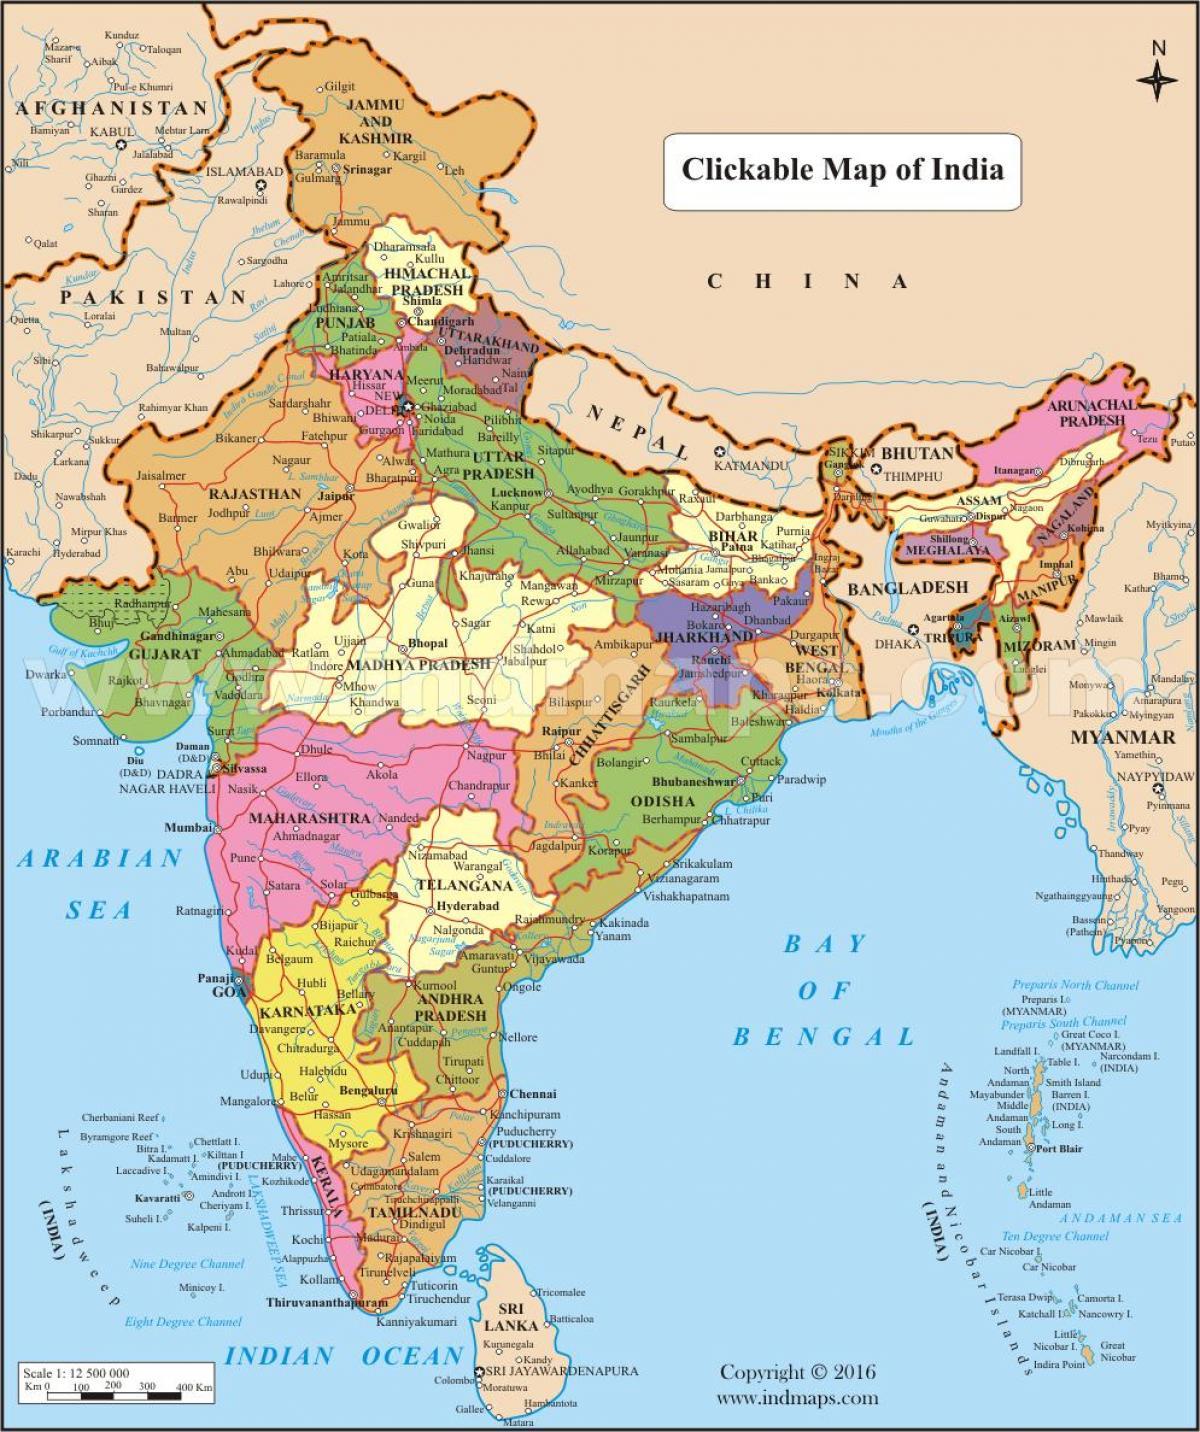 Indien Karta Bild Bilden Av Indien Karta Sodra Asien Asien